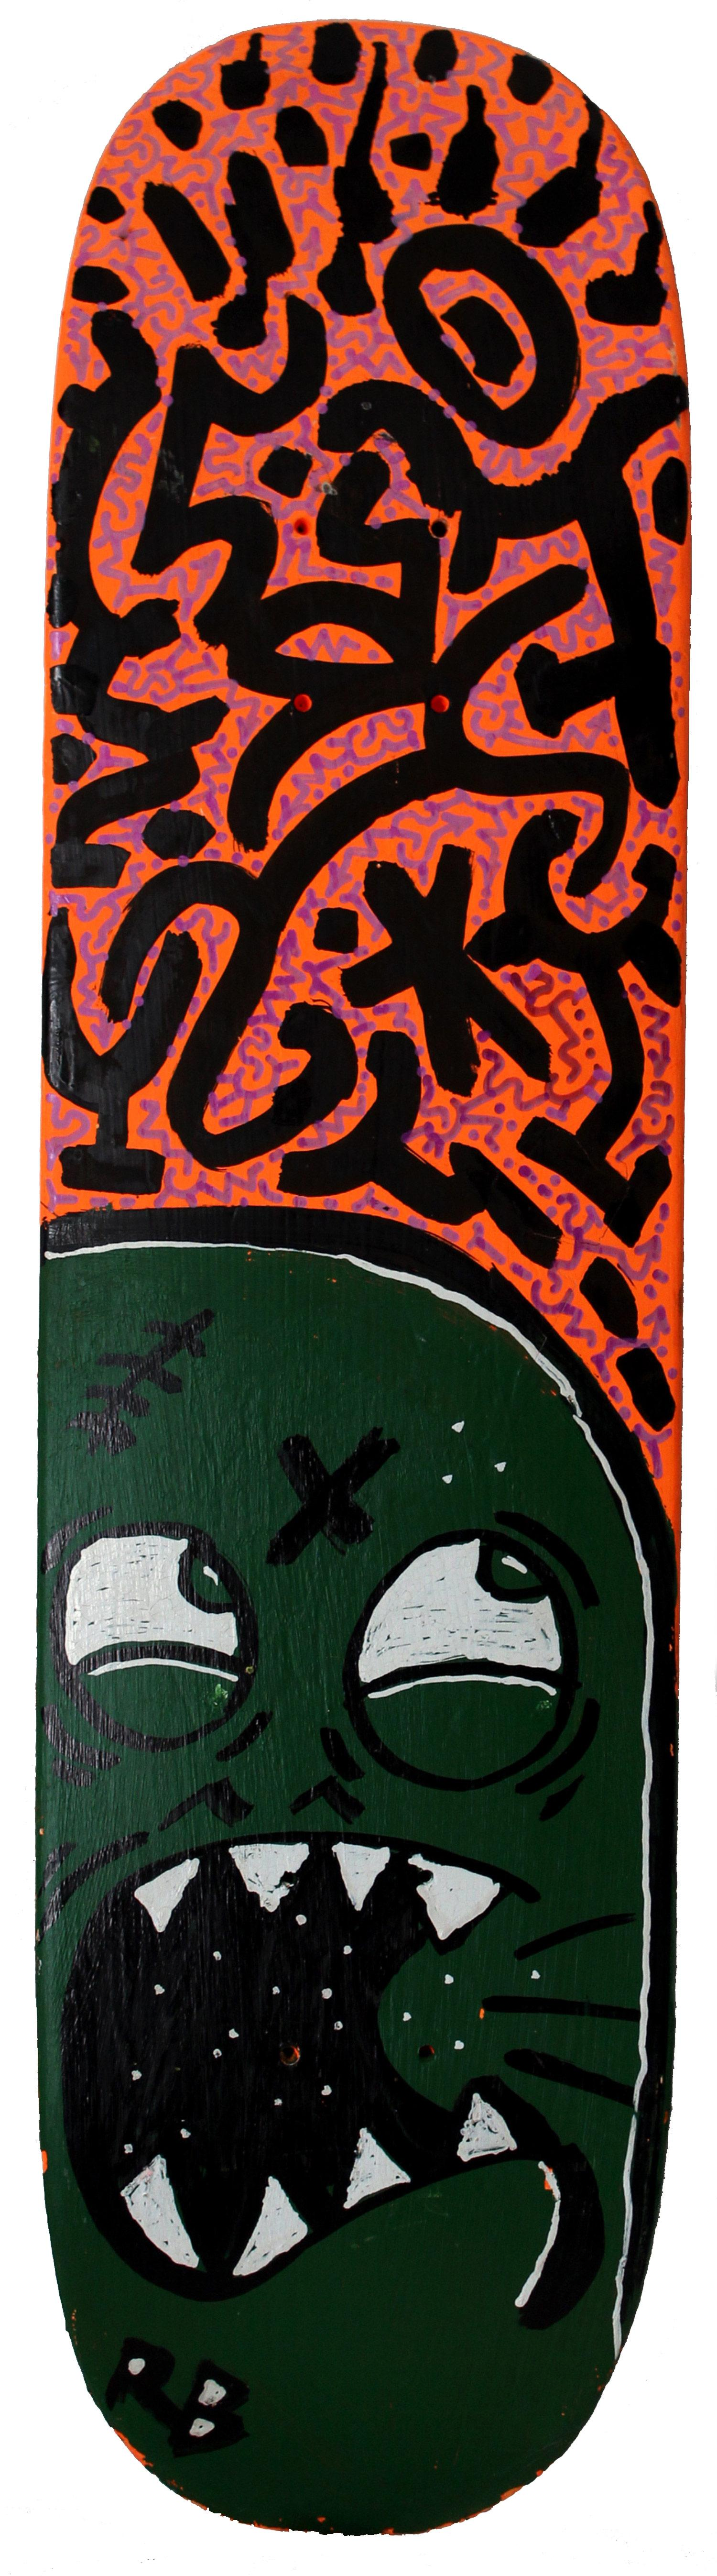 """LA2 Skateboard"" Decorated Graffiti Street Art Sculpture on Found Skateboard"